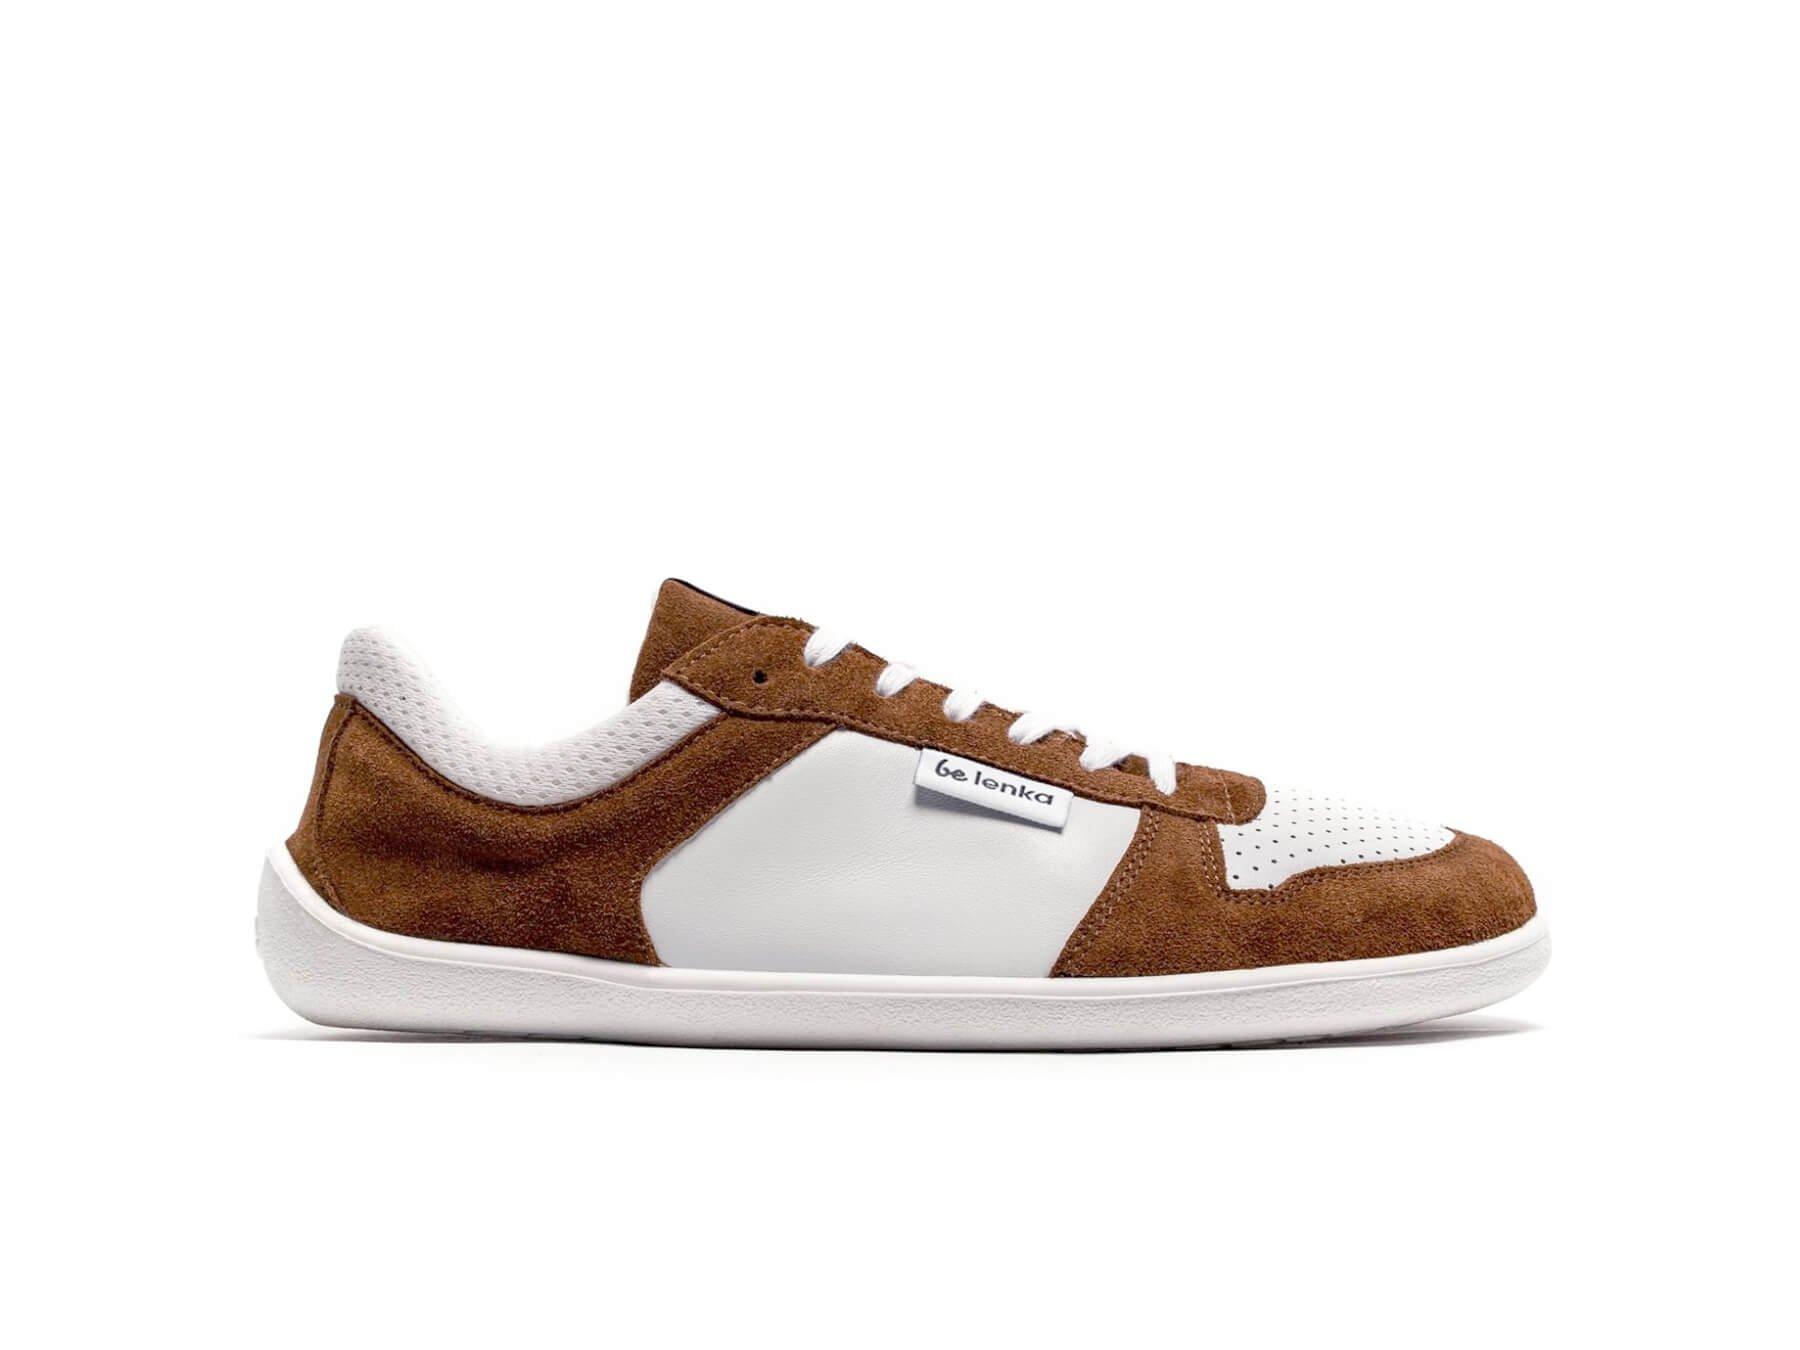 barefoot-basket-be-lenka-champ-brownie-1-liberty-pieds